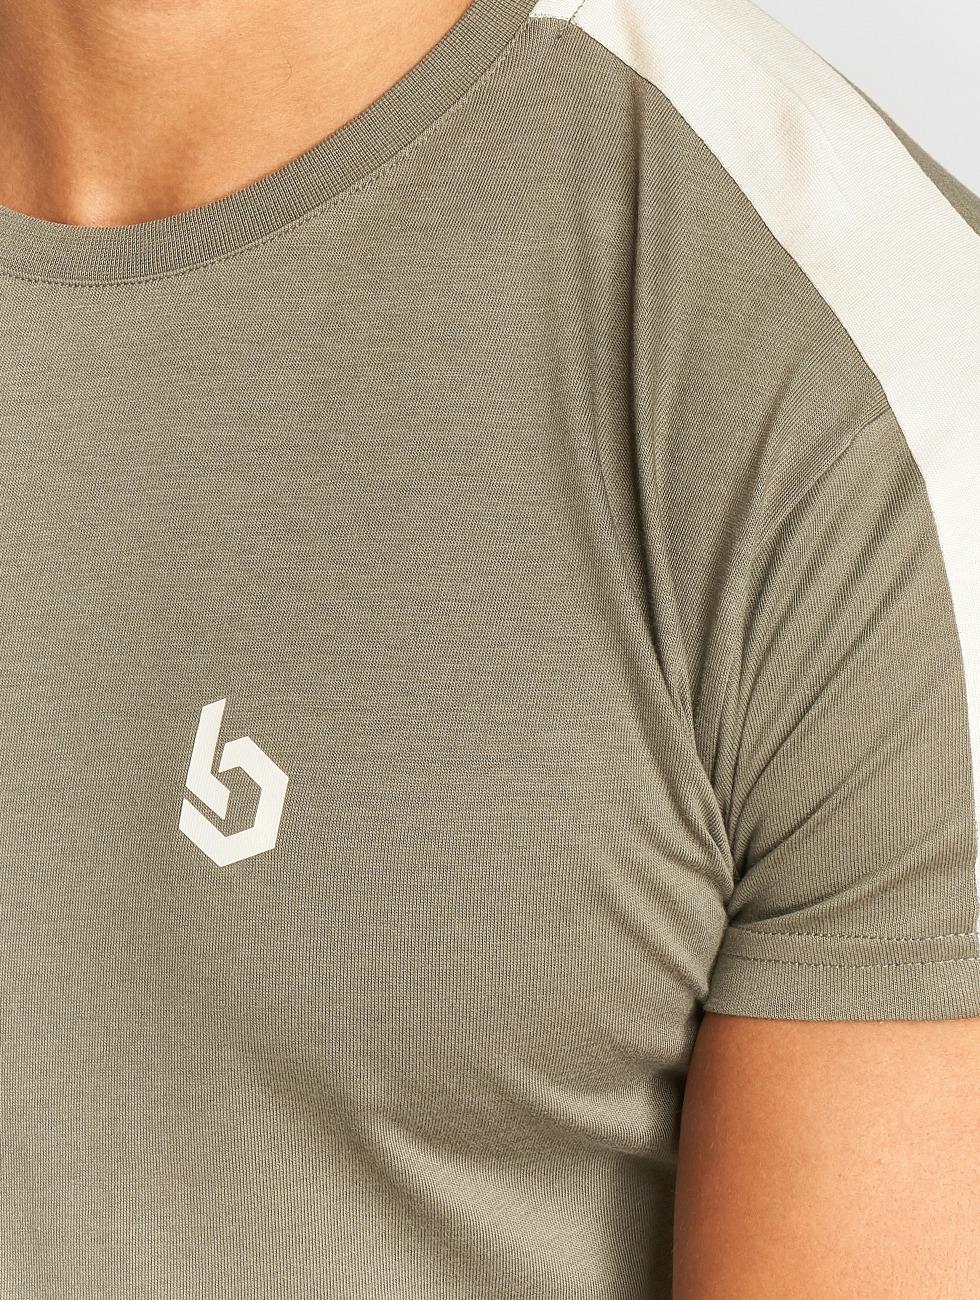 Beyond Limits T-Shirt Foundation khaki